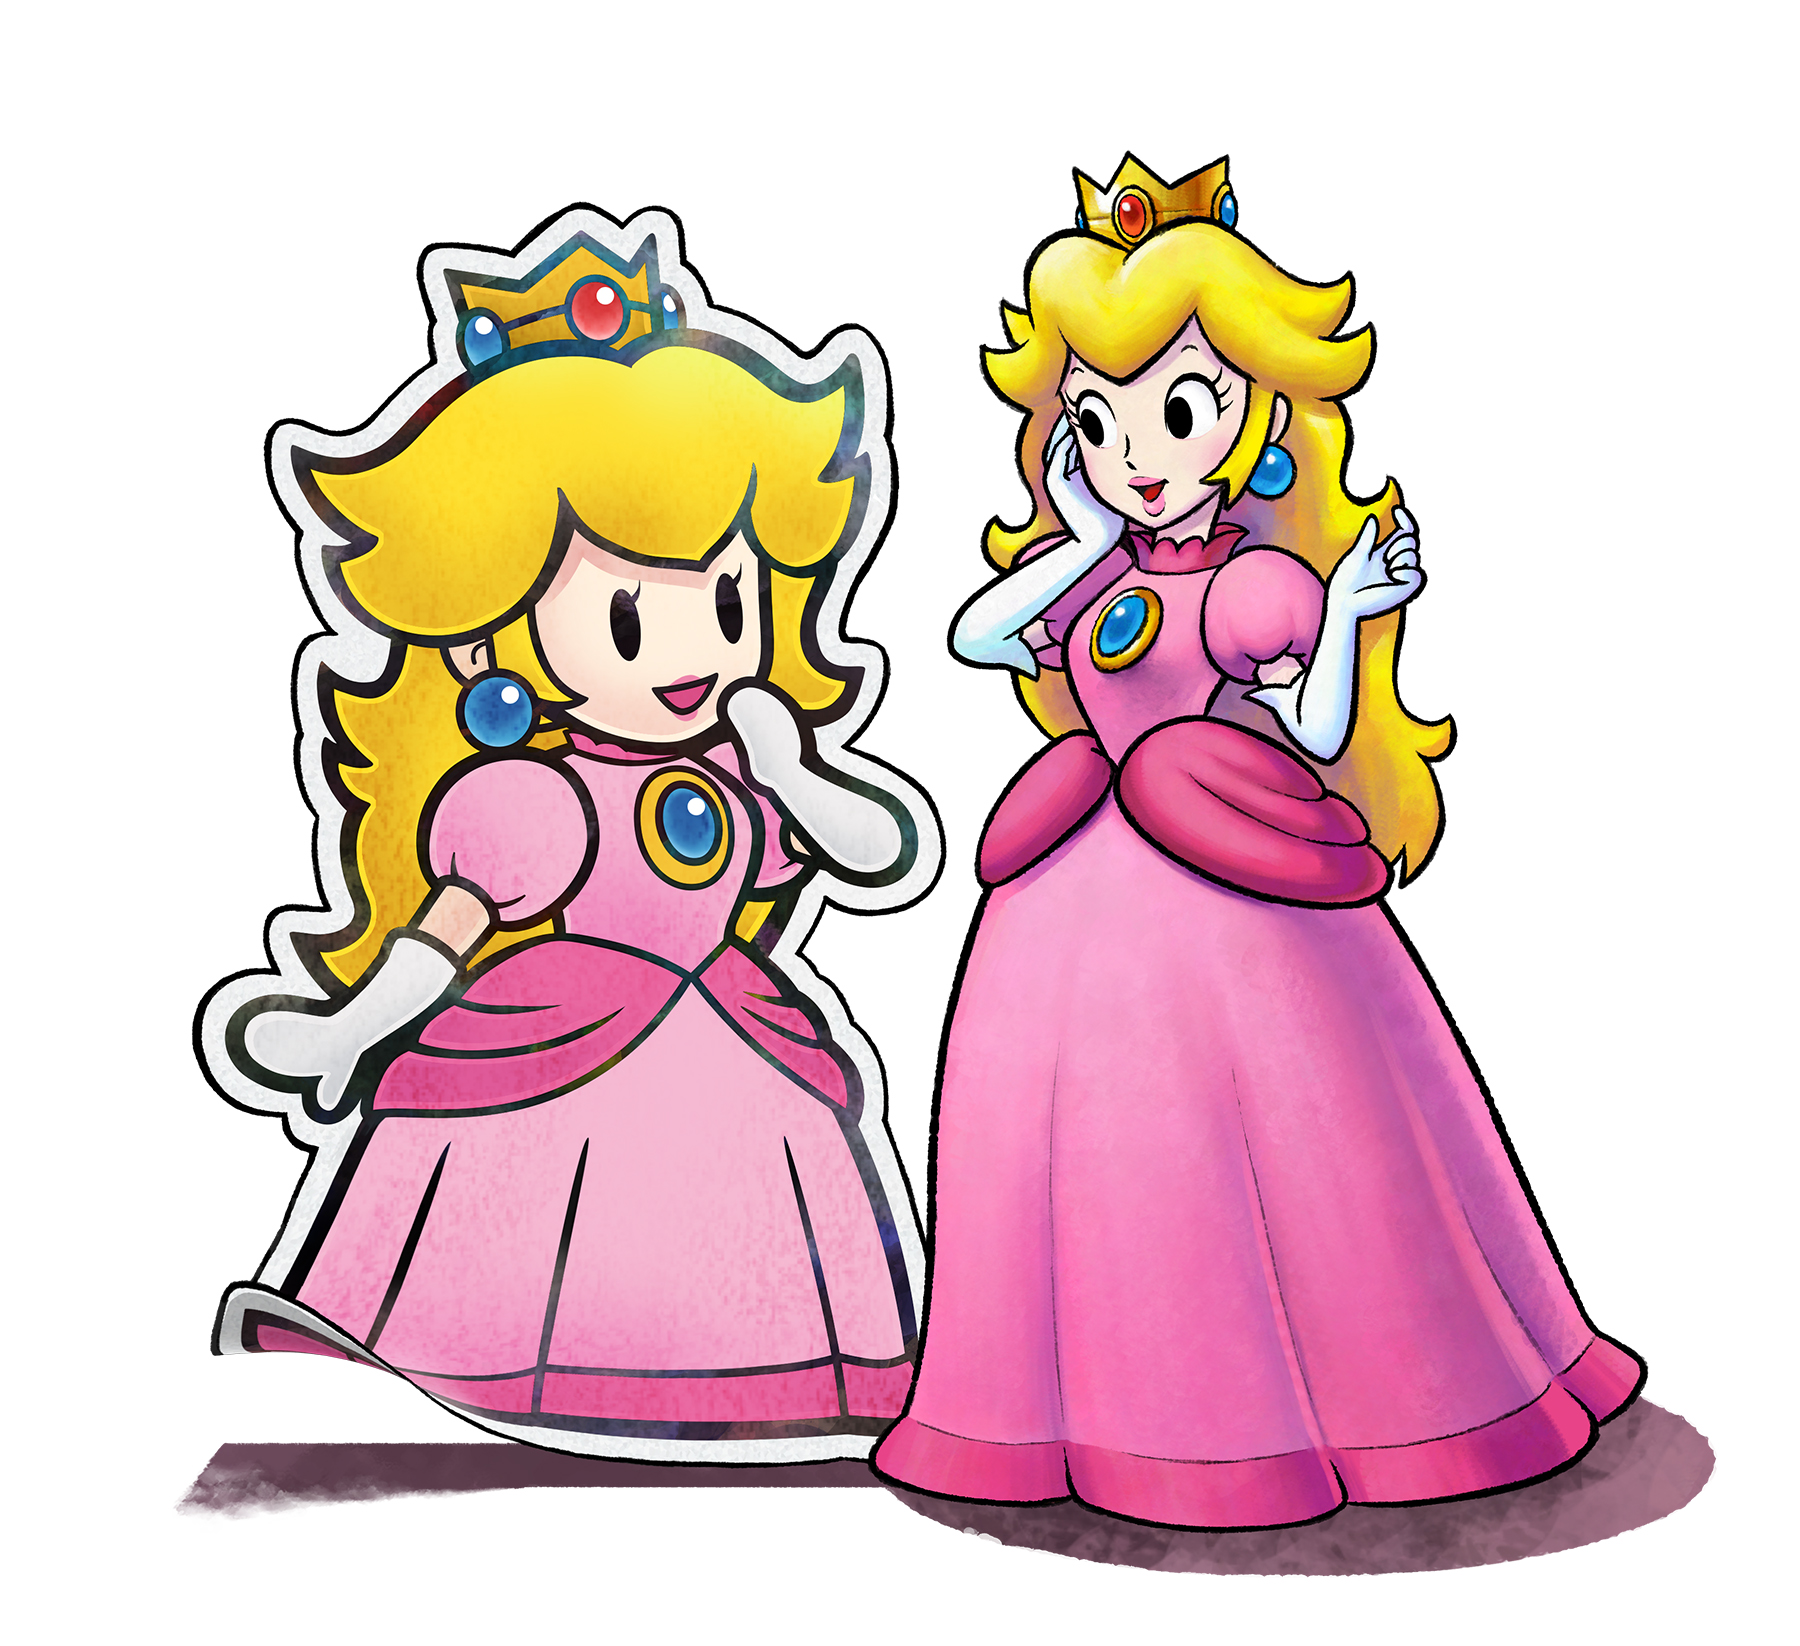 Peach Paper Peach Paper Mario Know Your Meme